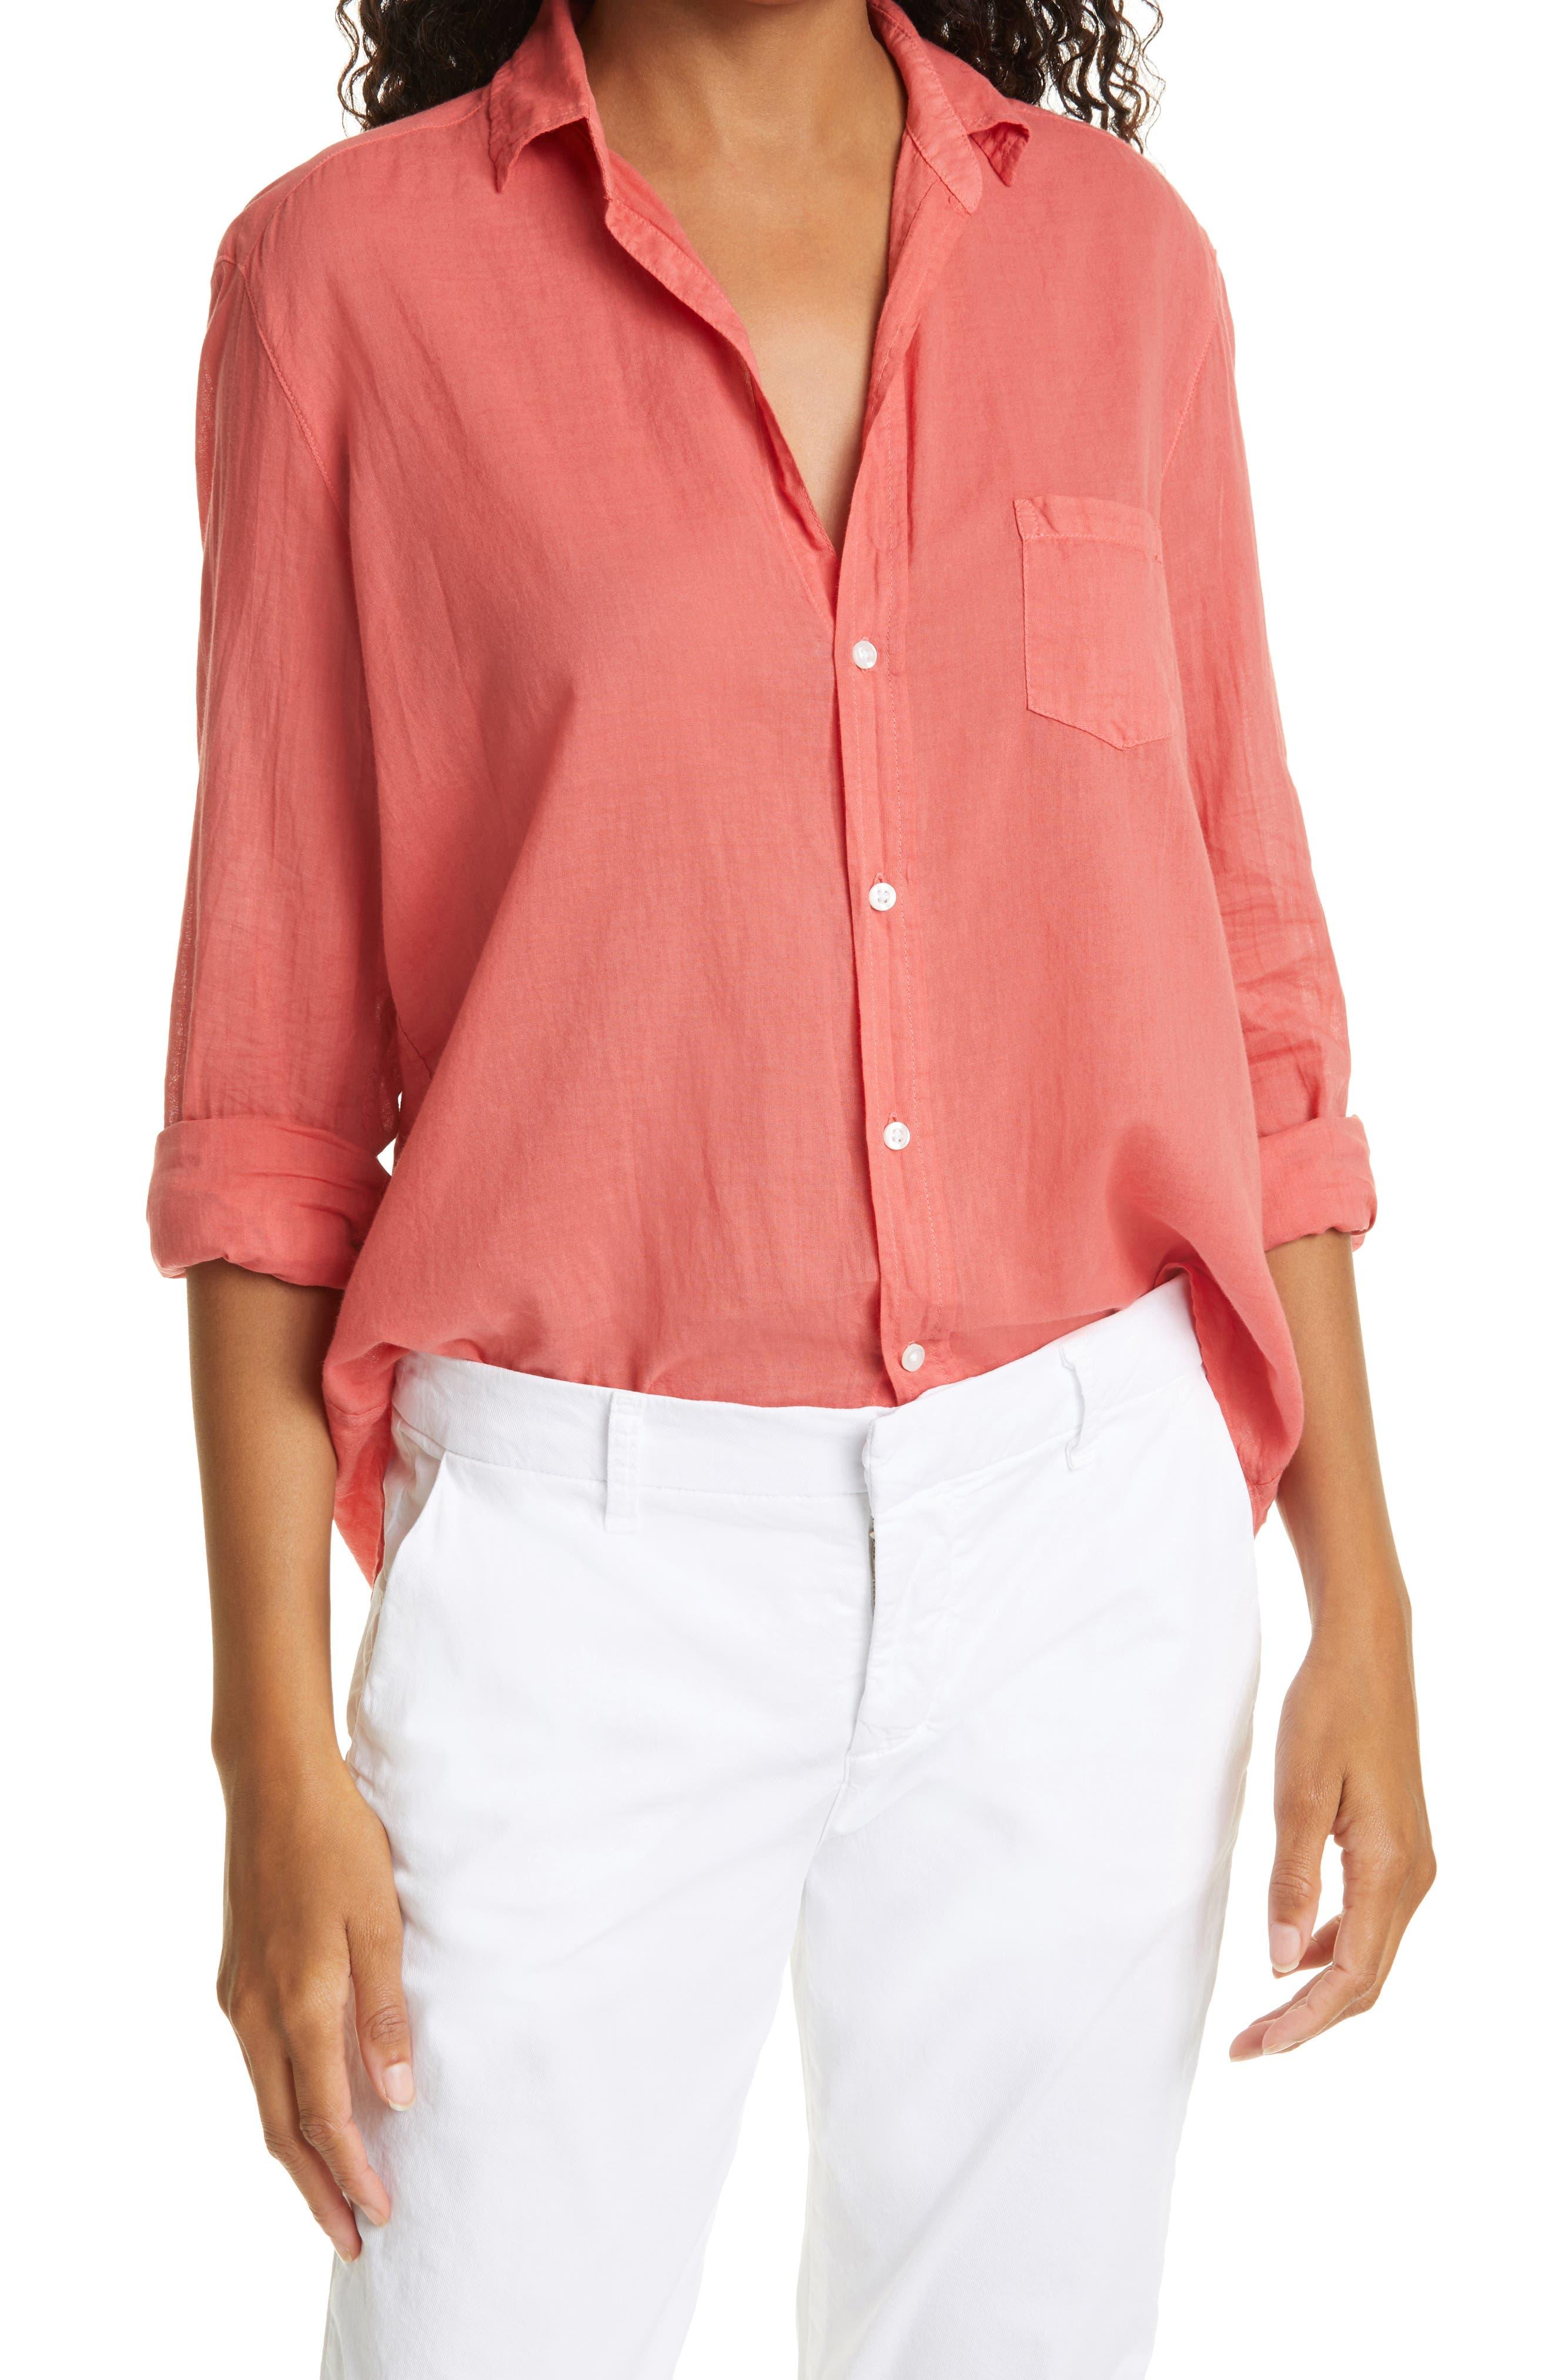 Cotton Woven Button-Up Shirt